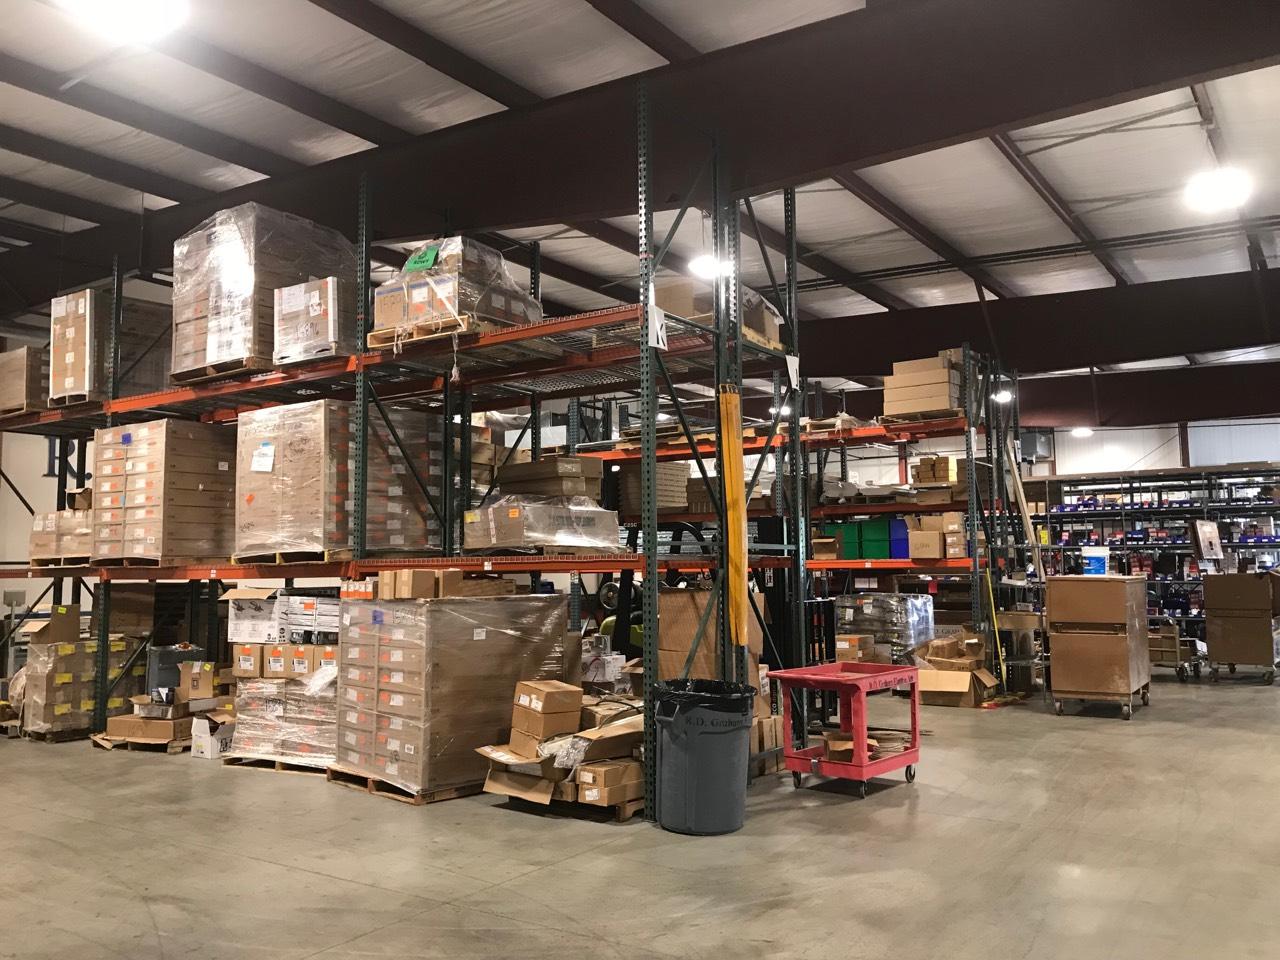 Warehouse Inventory.jpg